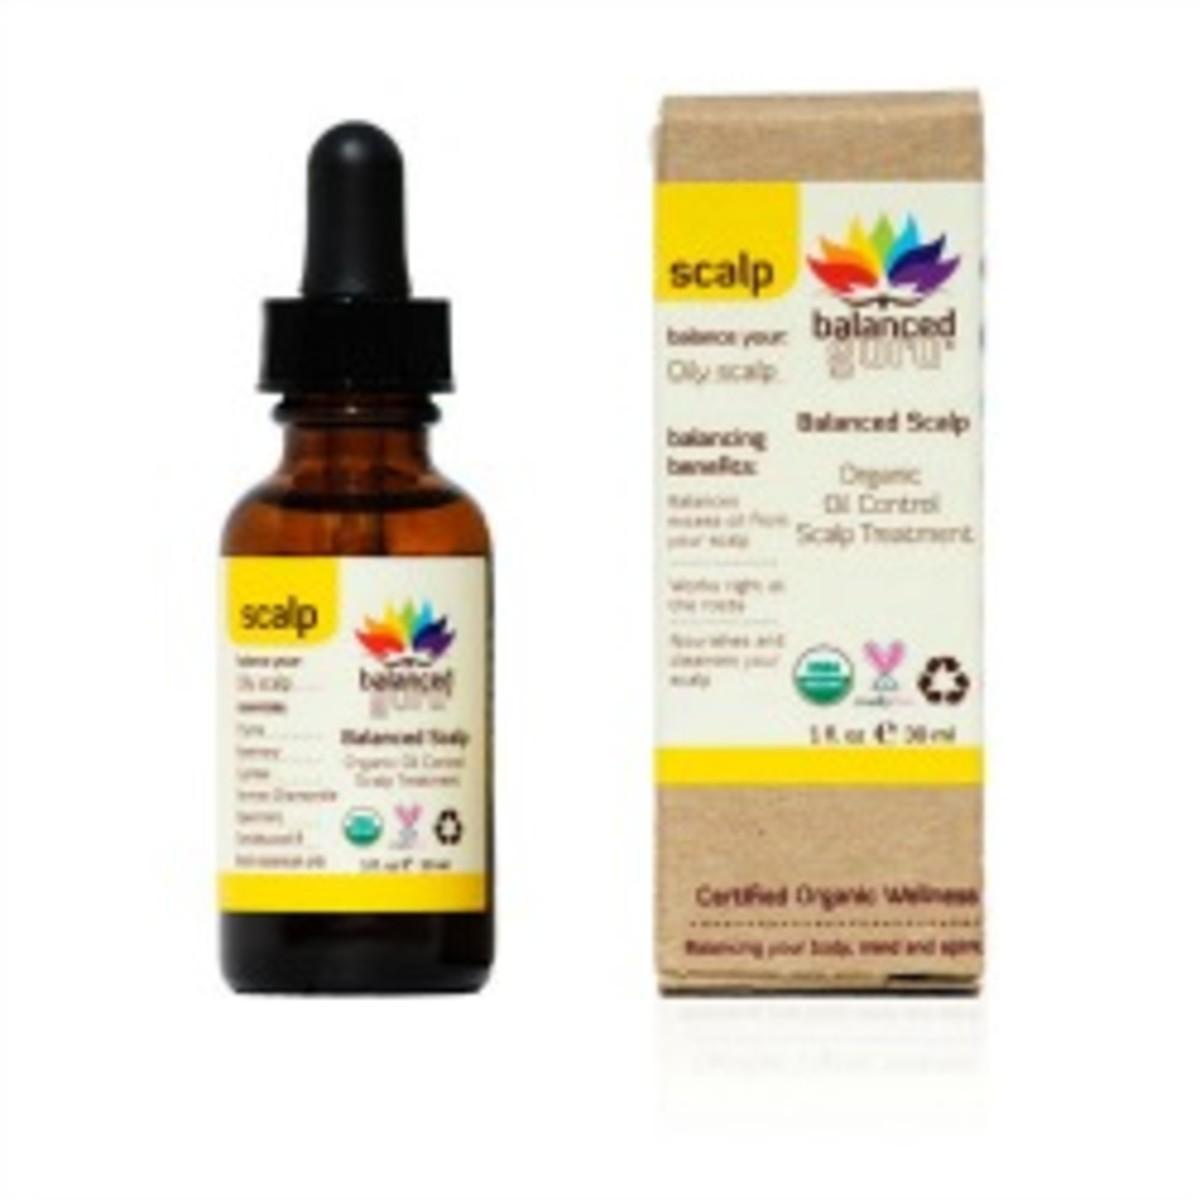 Winter Healthy Hair Secret Balanced Guru Organic Oil Control Scalp Treatment